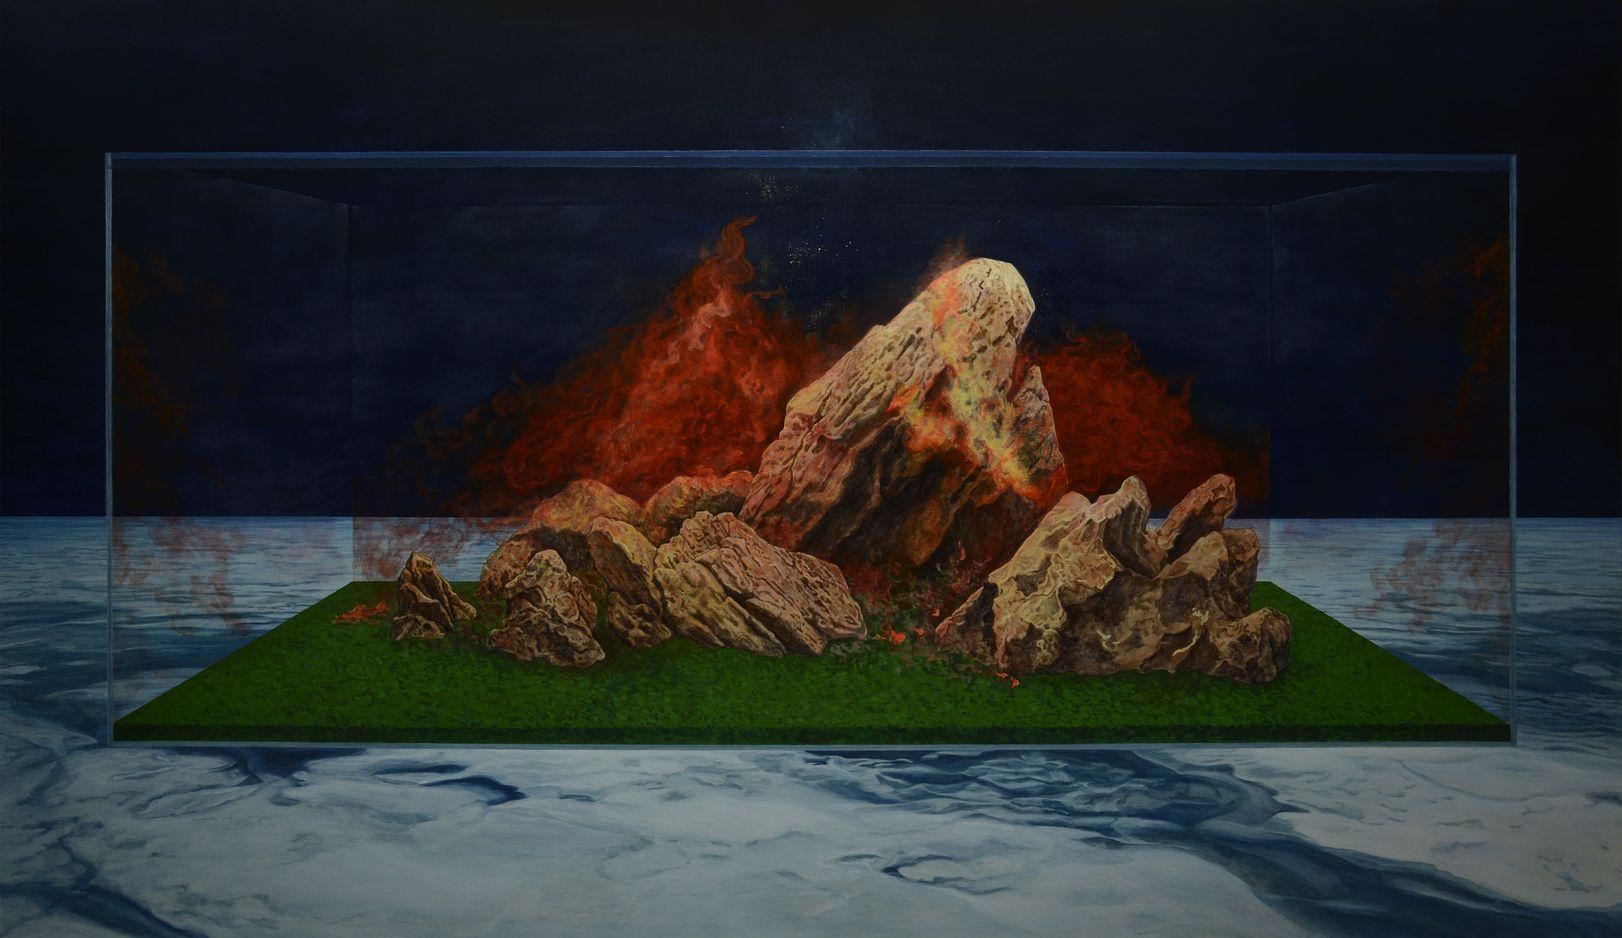 L'artiste chinois Li Donglu, A2Z Art Gallery